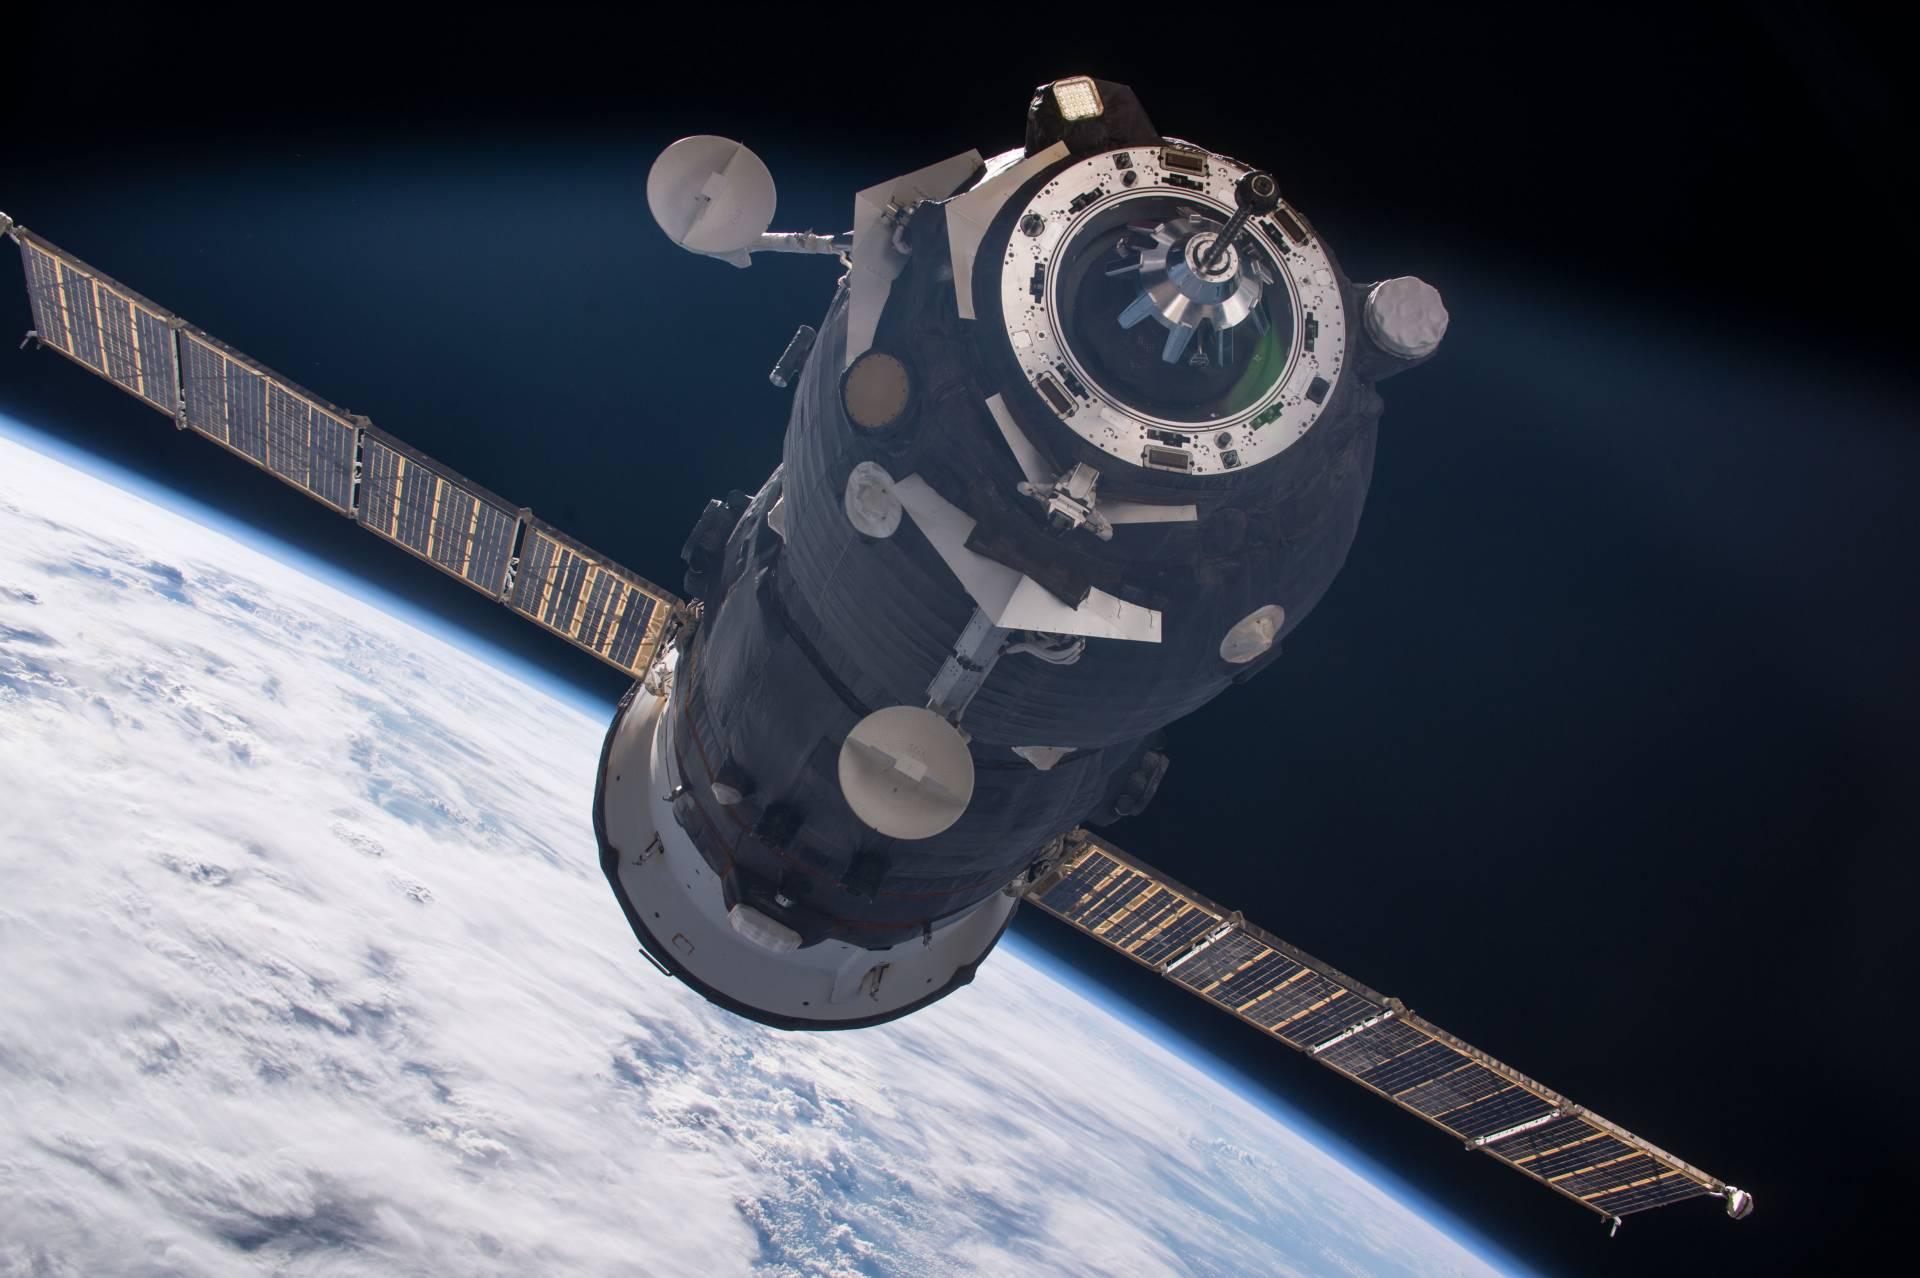 Soyuz capsule NASA Russia